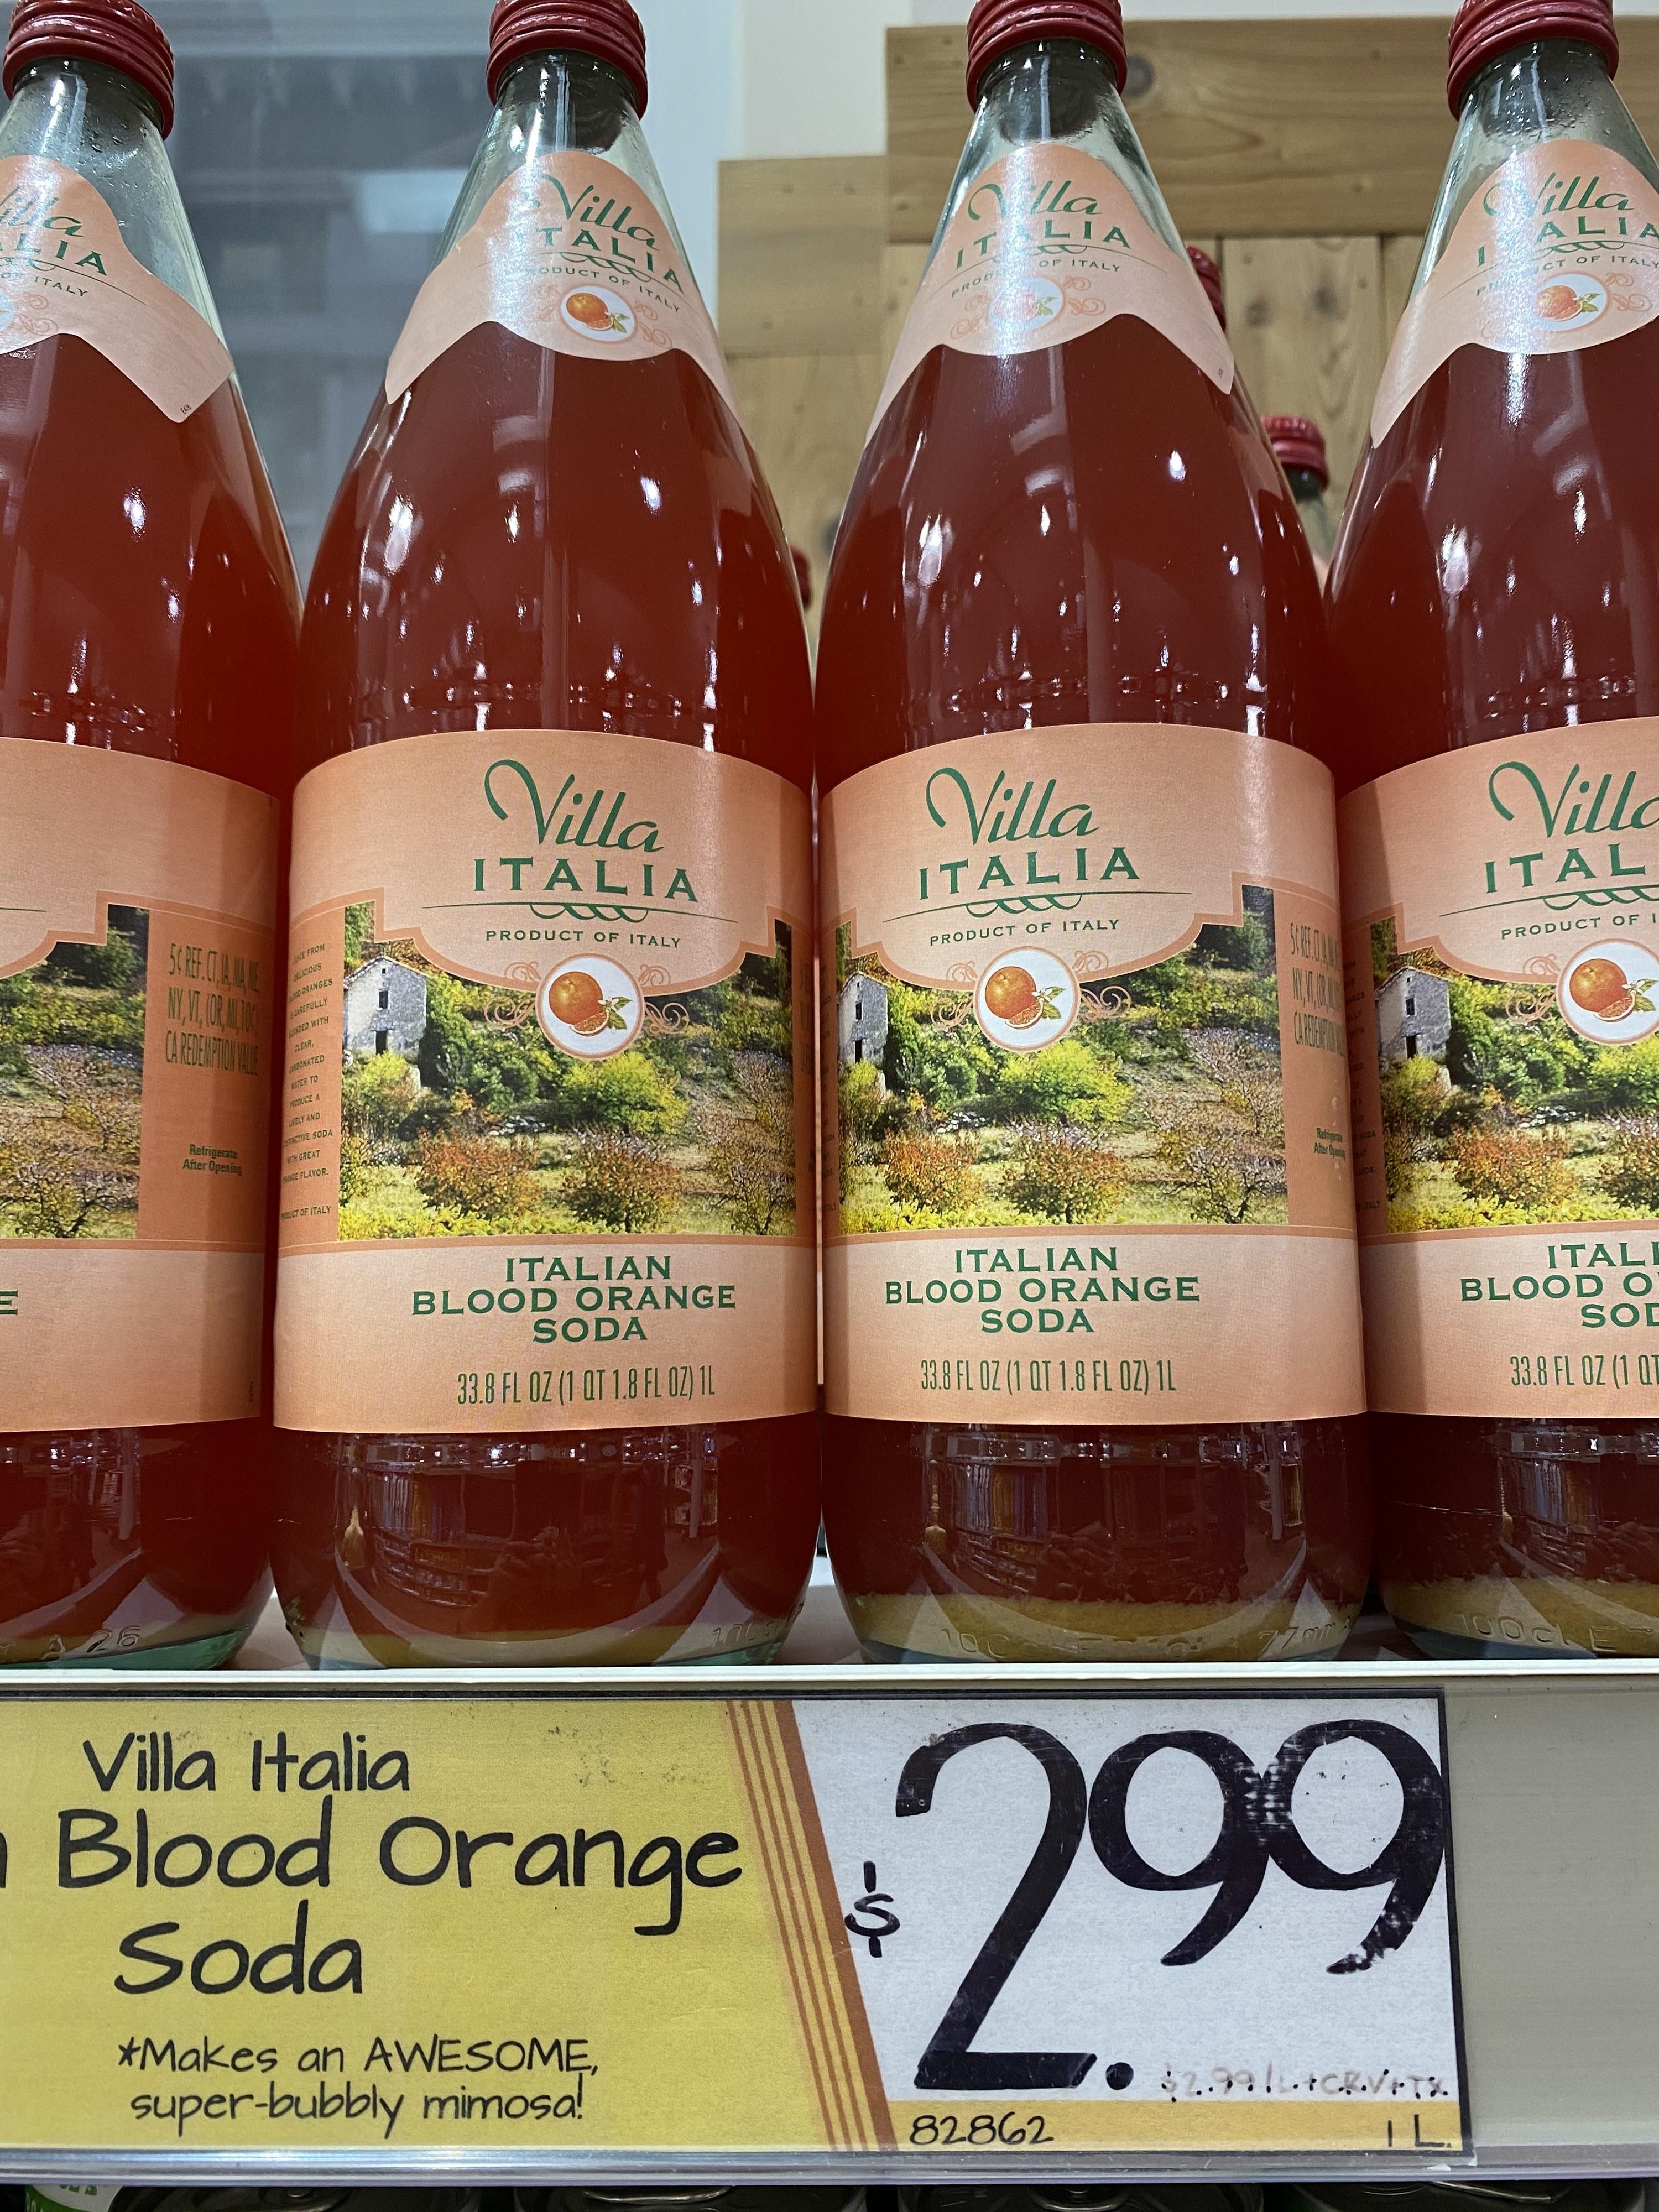 Villa Italia Italian Blood Orange Soda.